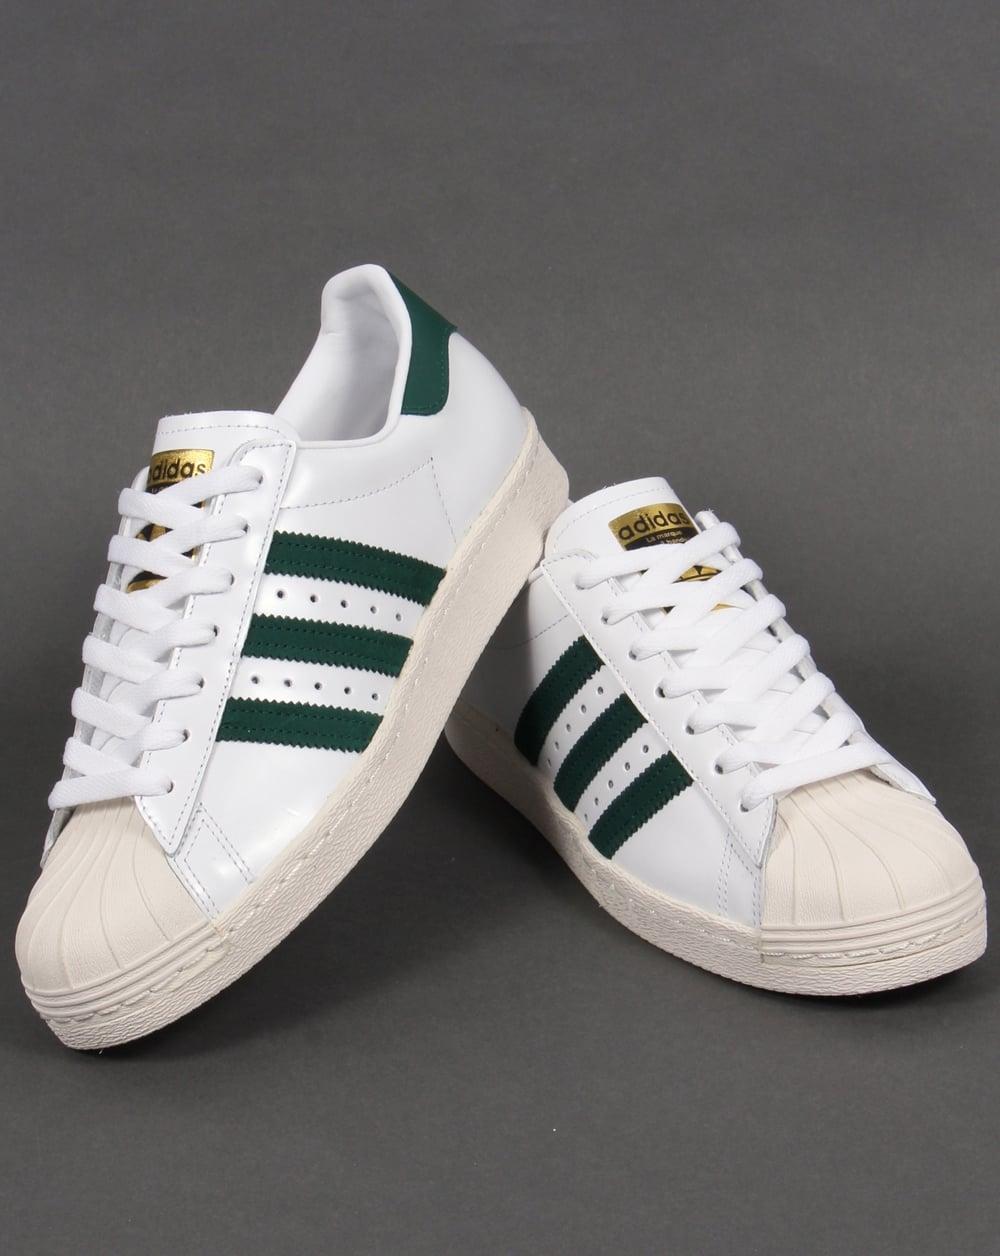 adidas superstar 80s trainers white green originals shell. Black Bedroom Furniture Sets. Home Design Ideas